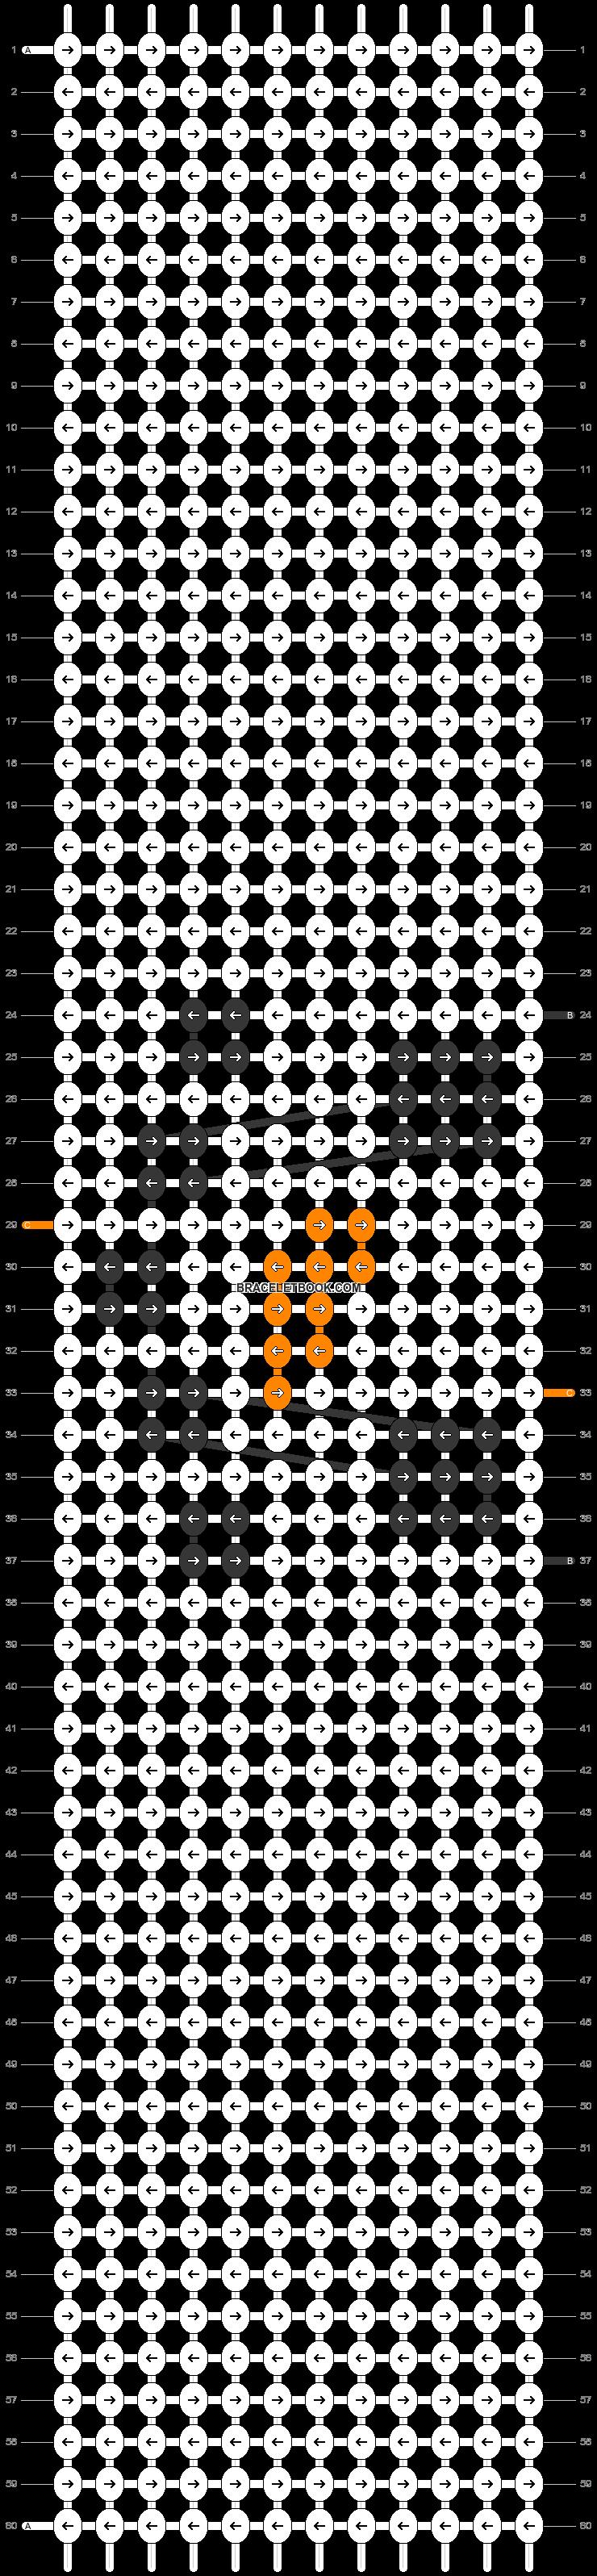 Alpha pattern #59448 pattern